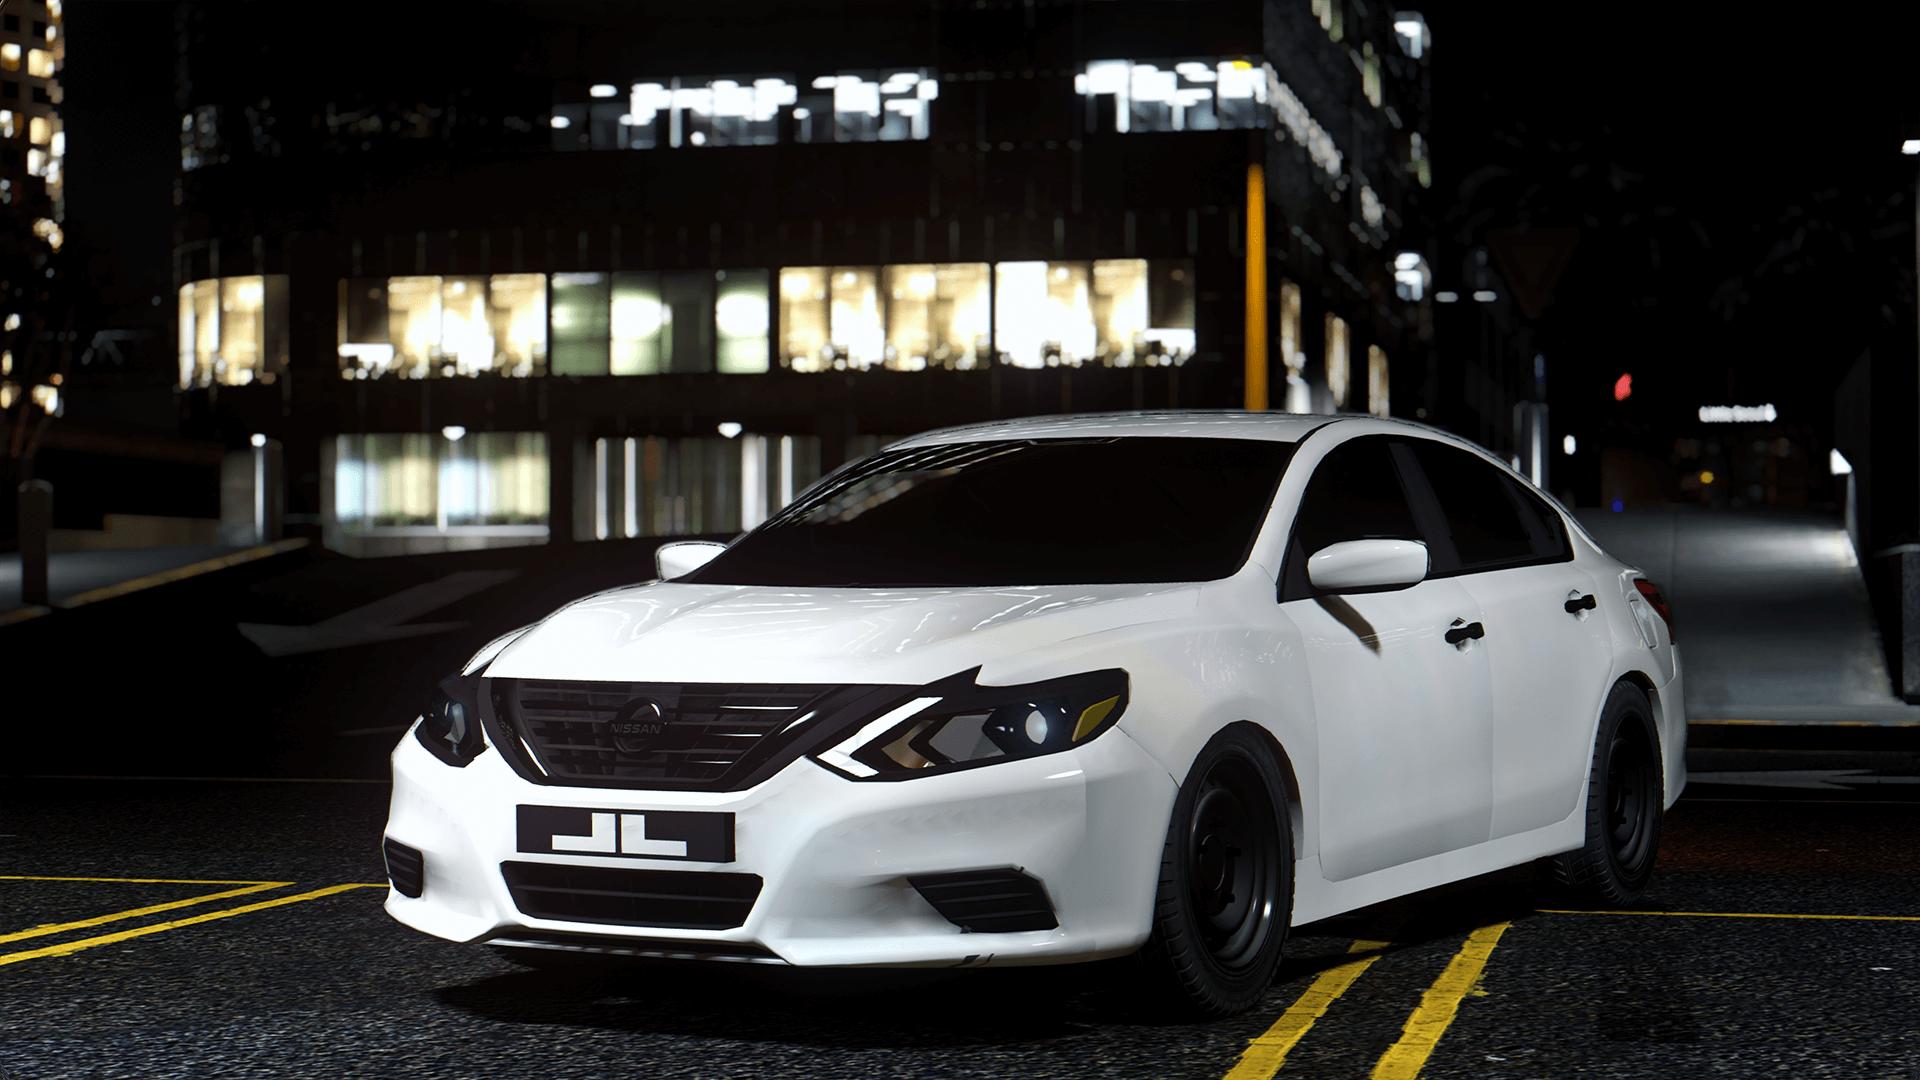 Nissan Altima 2017 Standard [Replace] - GTA5-Mods.com